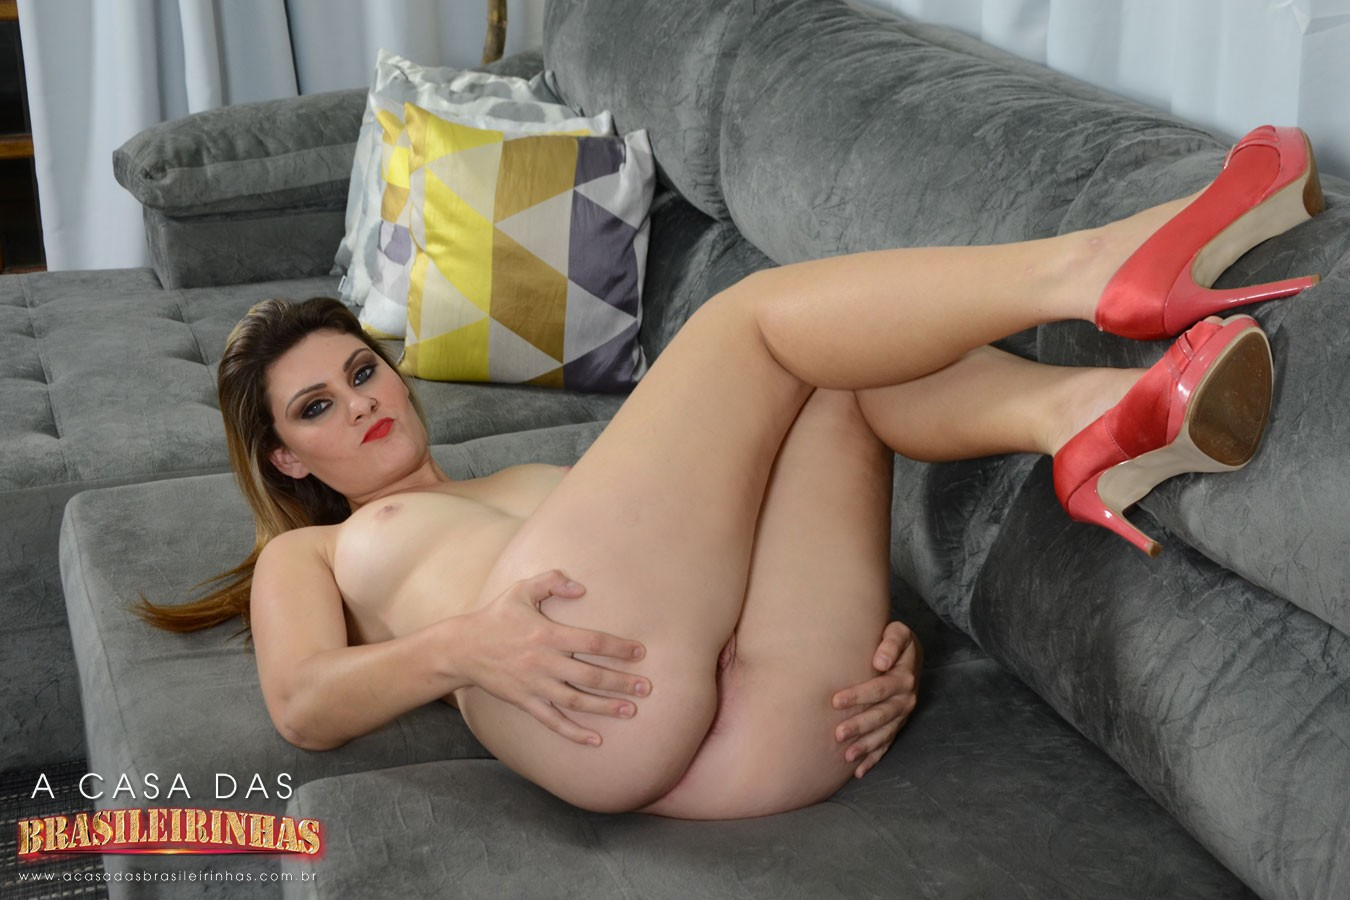 nayra-mendes-bem-gostosa-no-sofa.jpg